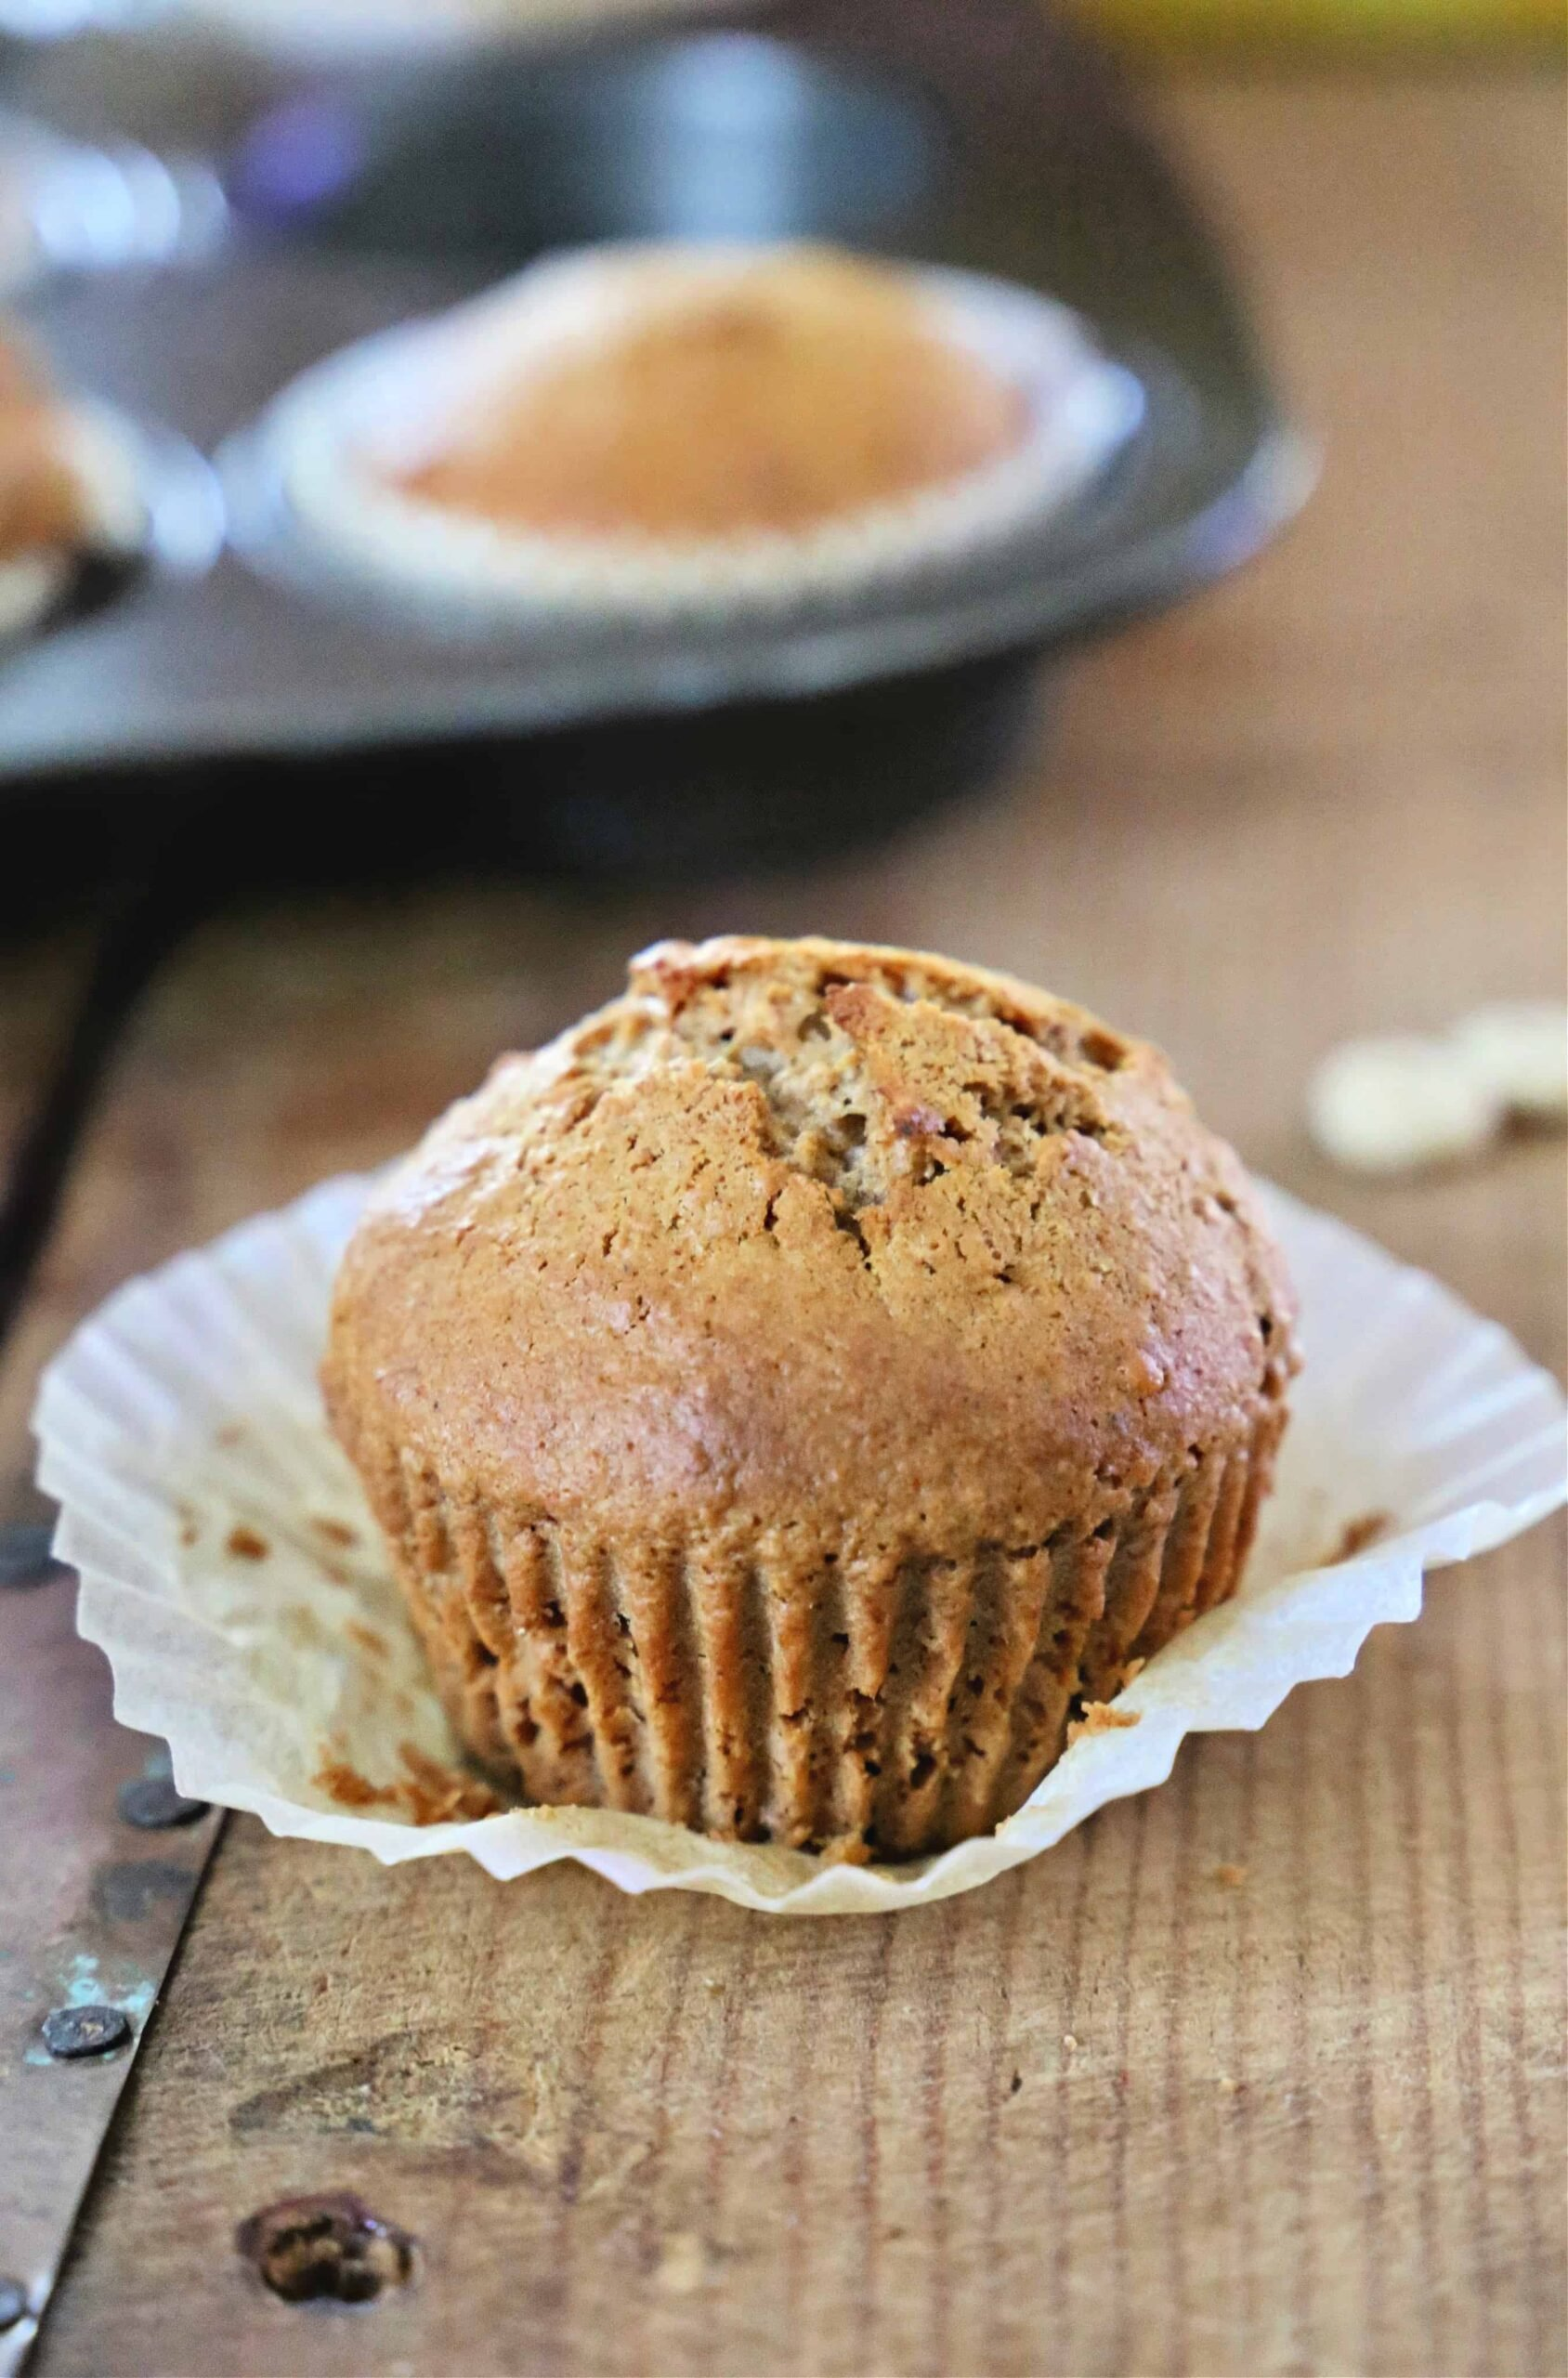 Honey Nut Muffin on cutting board